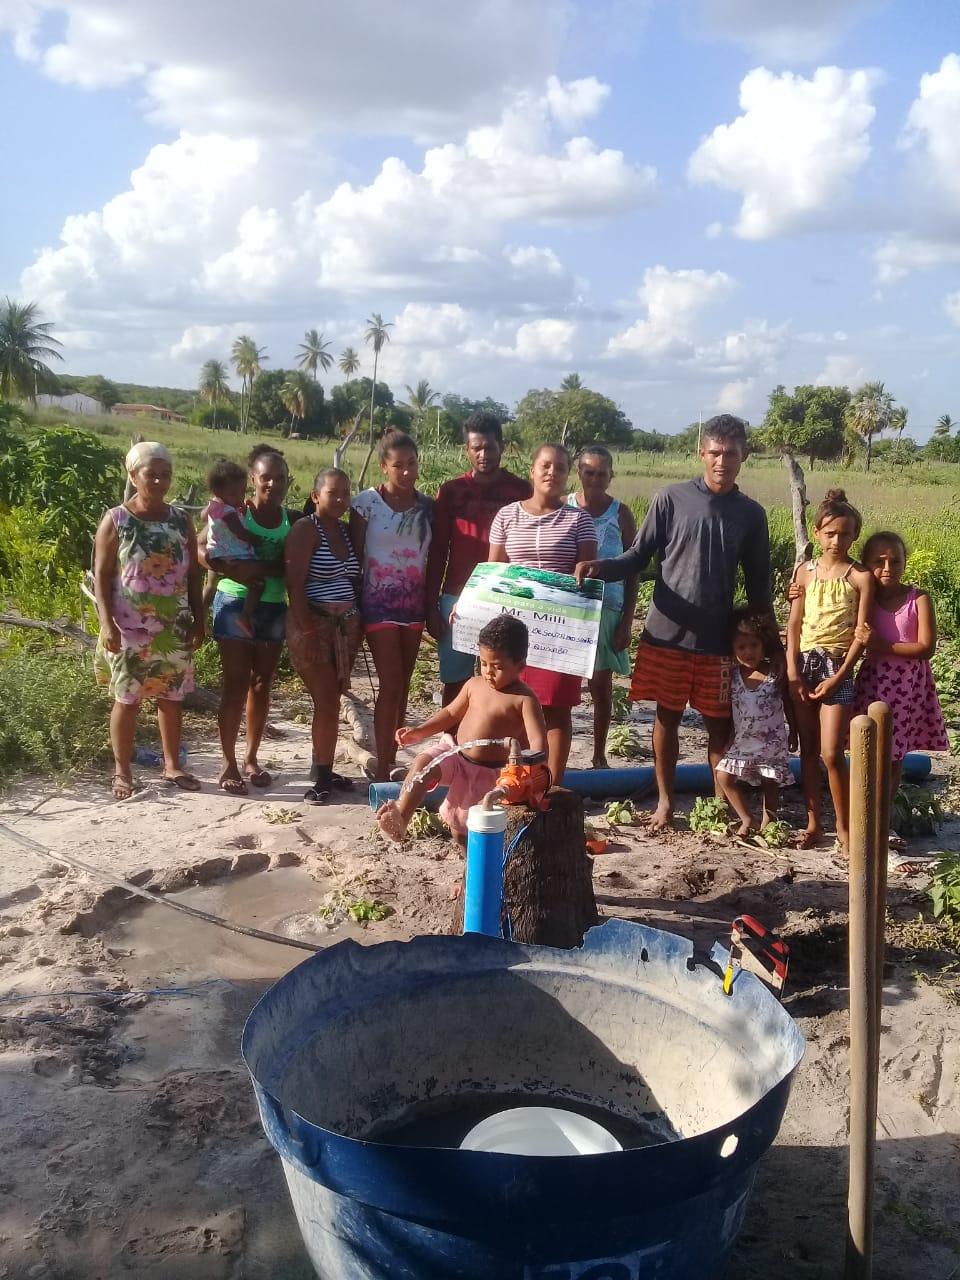 2020-12-21 Bahia - Image 1